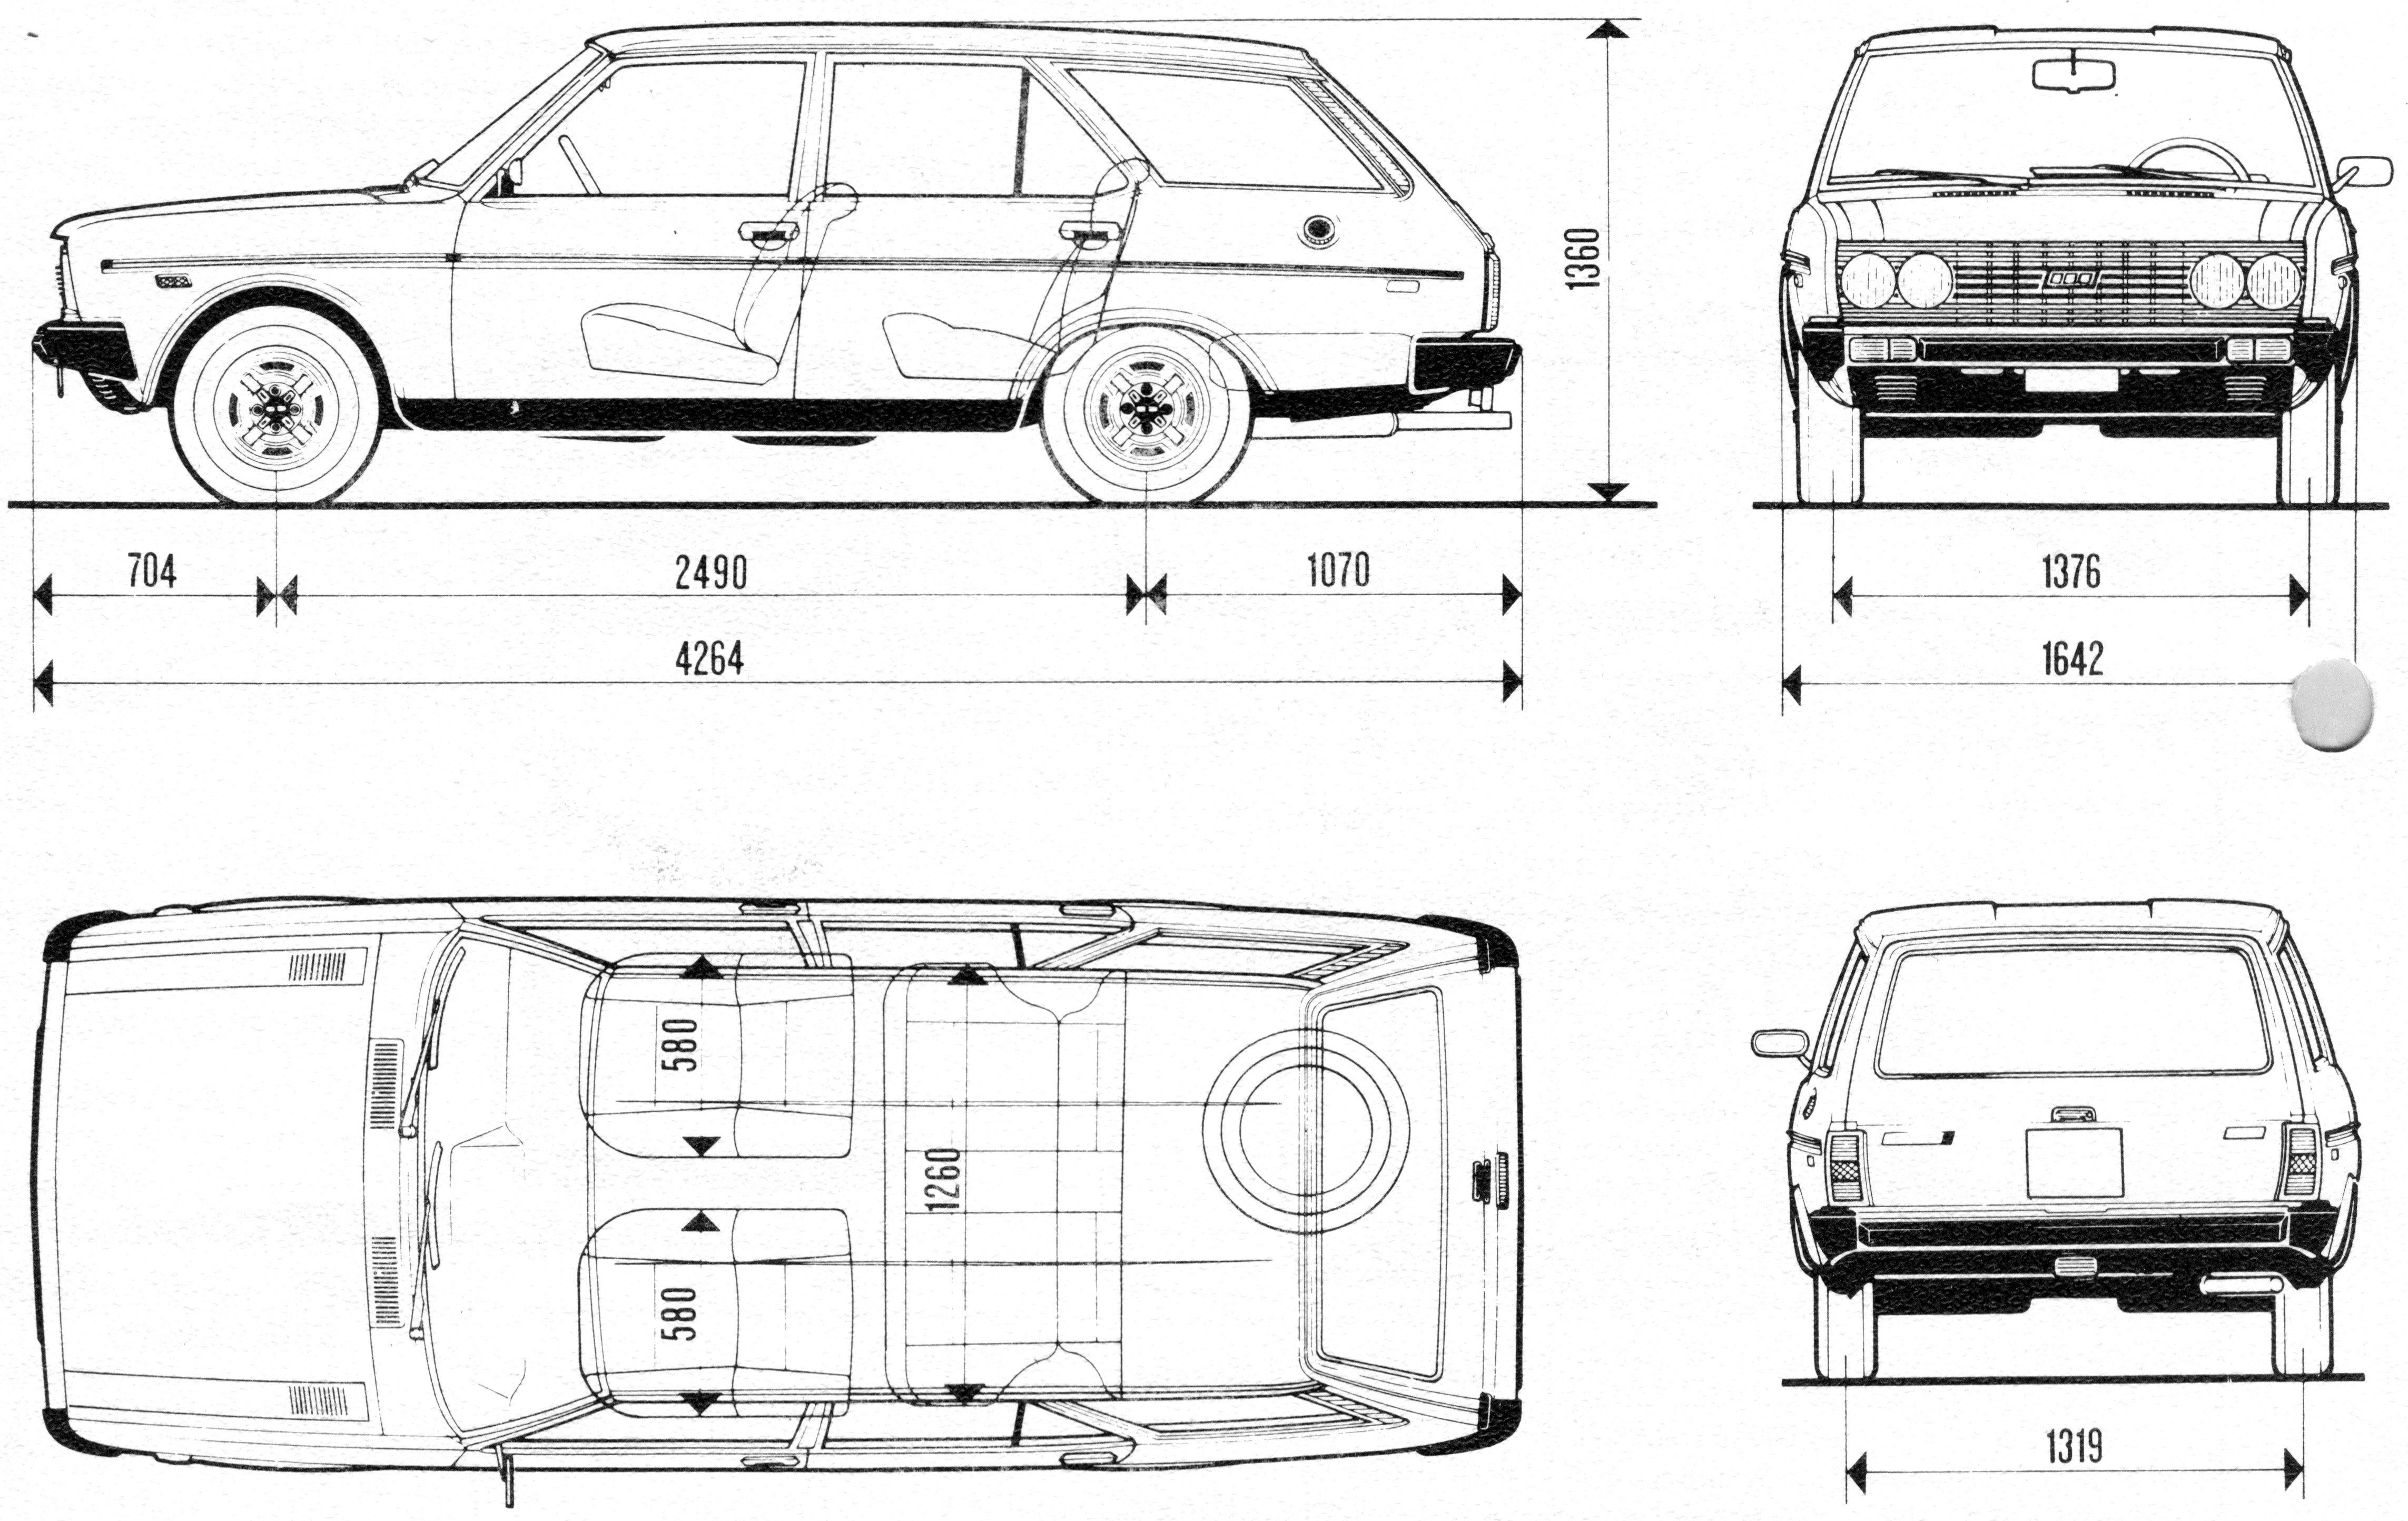 Fiat 131 Blueprint - Download free blueprint for 3D modeling